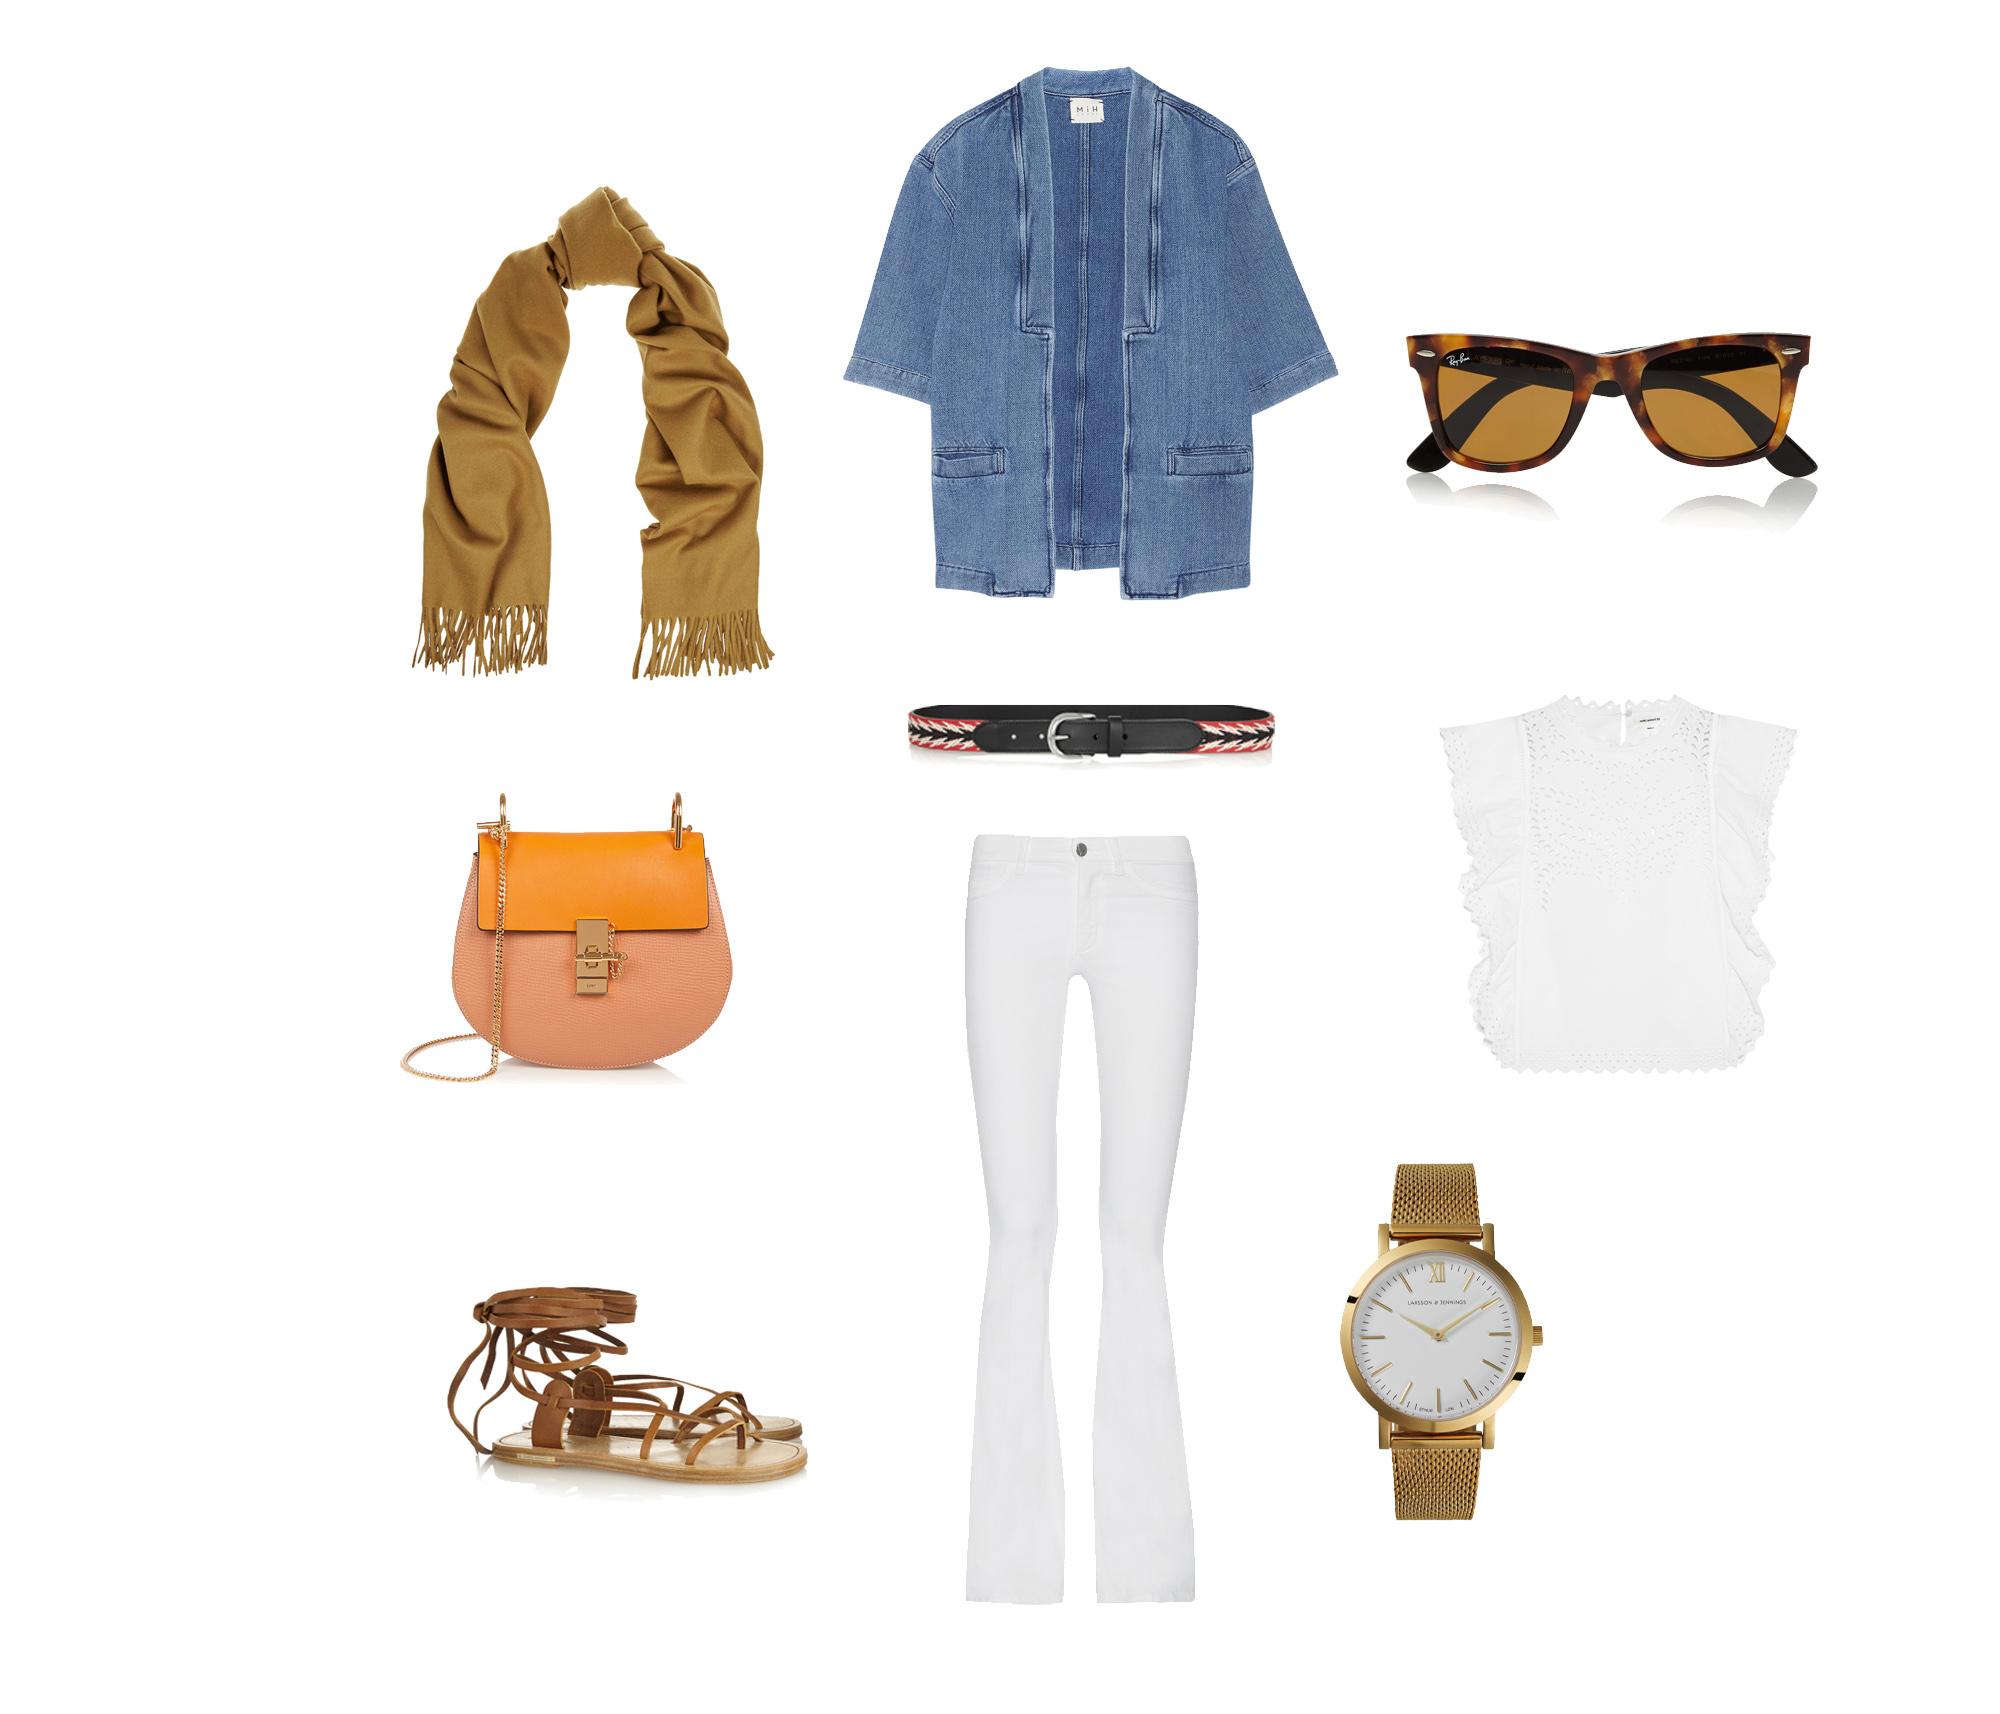 Clochet_mih_jeans_marrakesh_isabel_marant_etoile_sandals_chloe_drew_bag